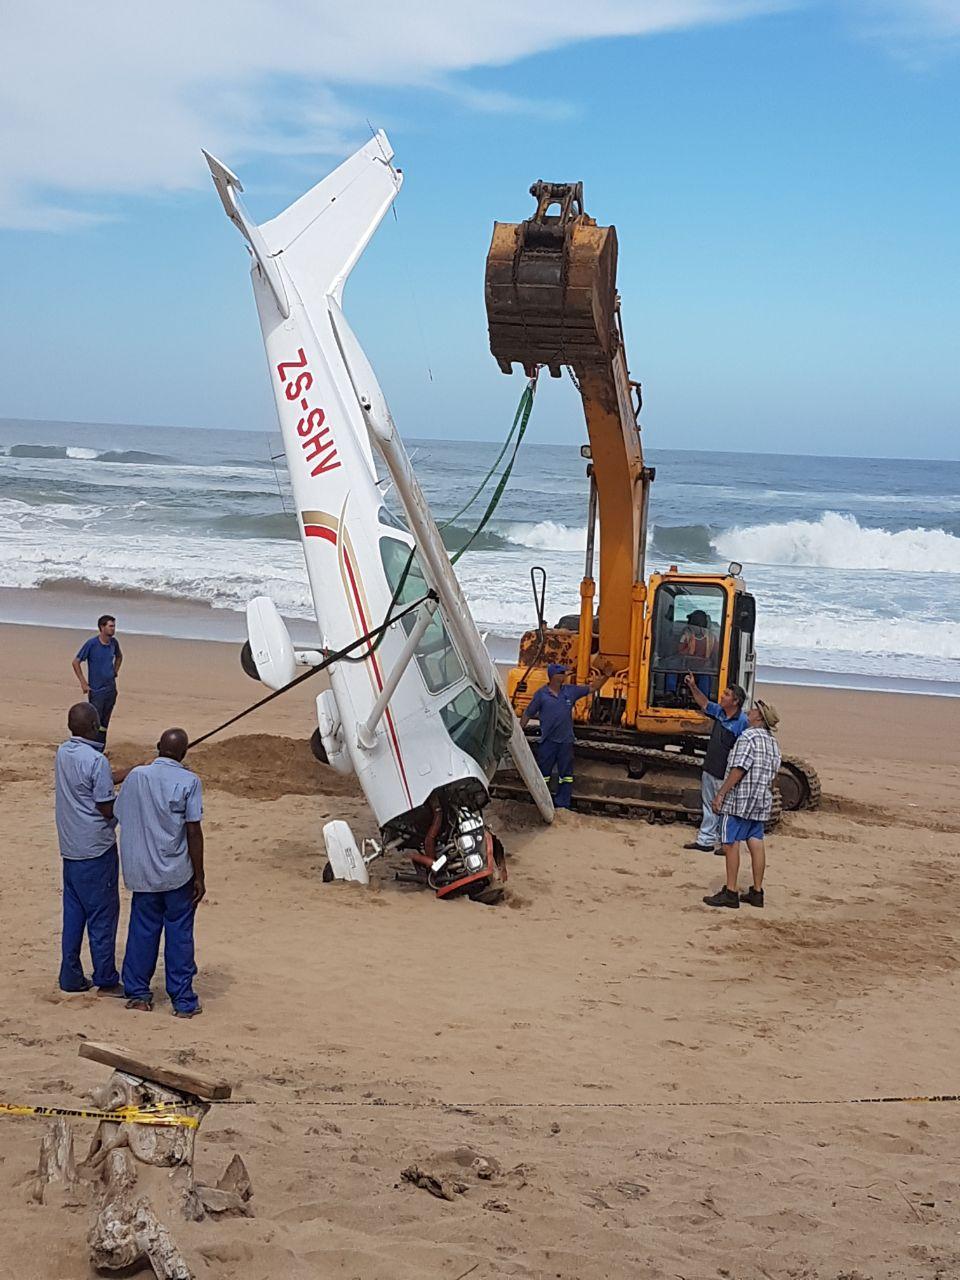 Breaking News Virginia Beach Plane Crash